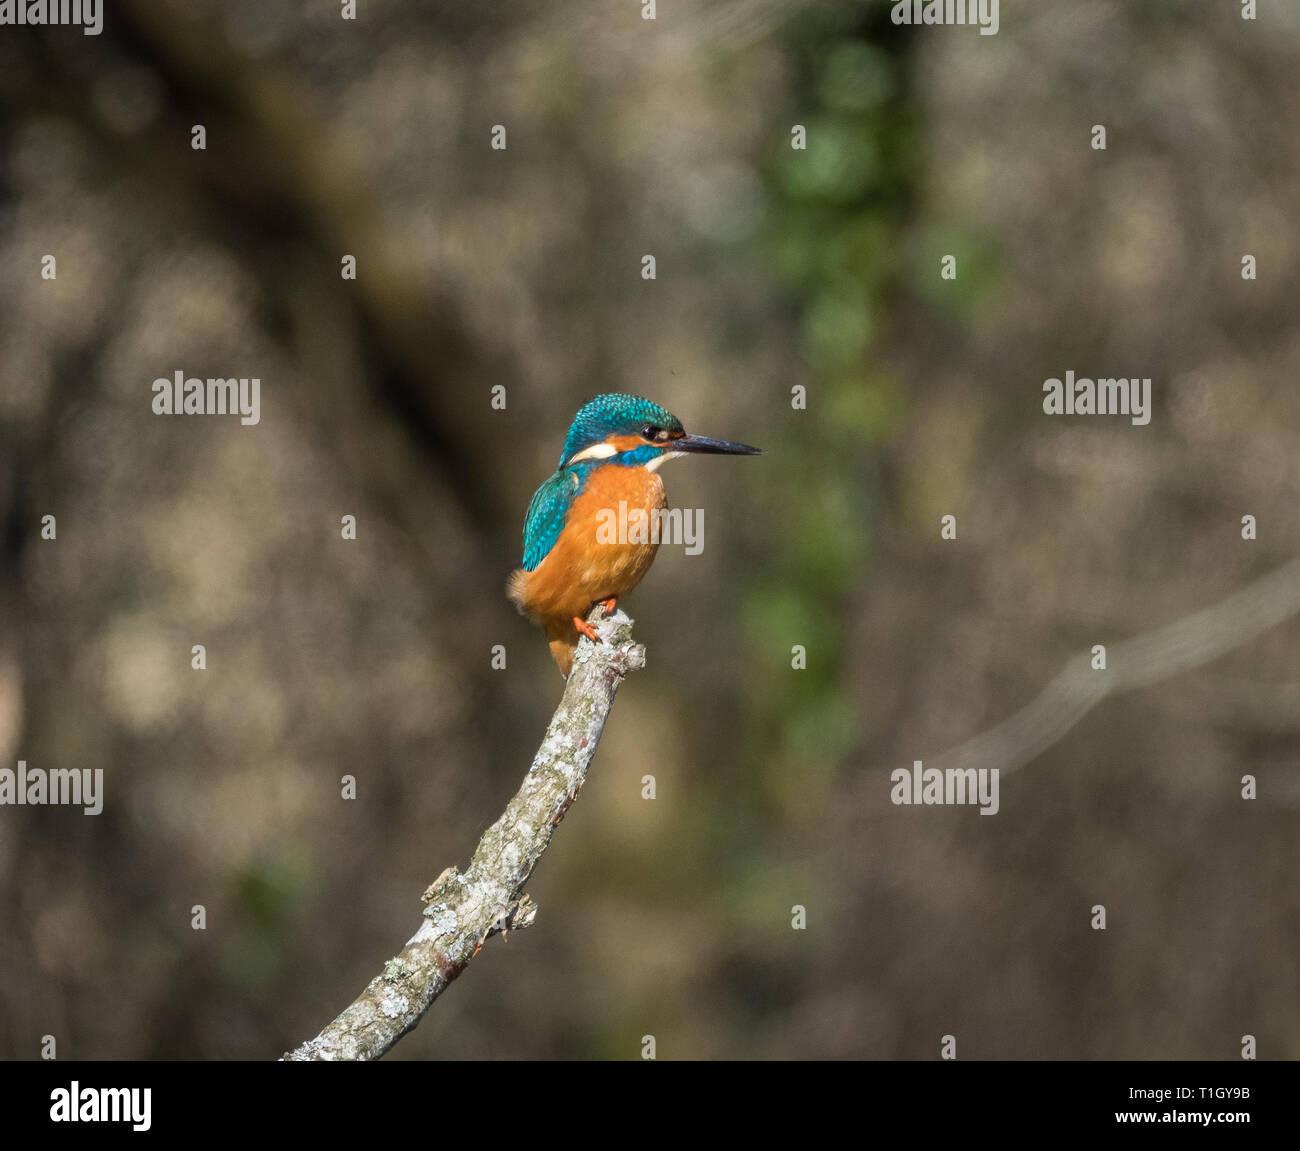 Kingfisher, Teifi Marshes, Welsh Wildlife Centre, Wales Stock Photo